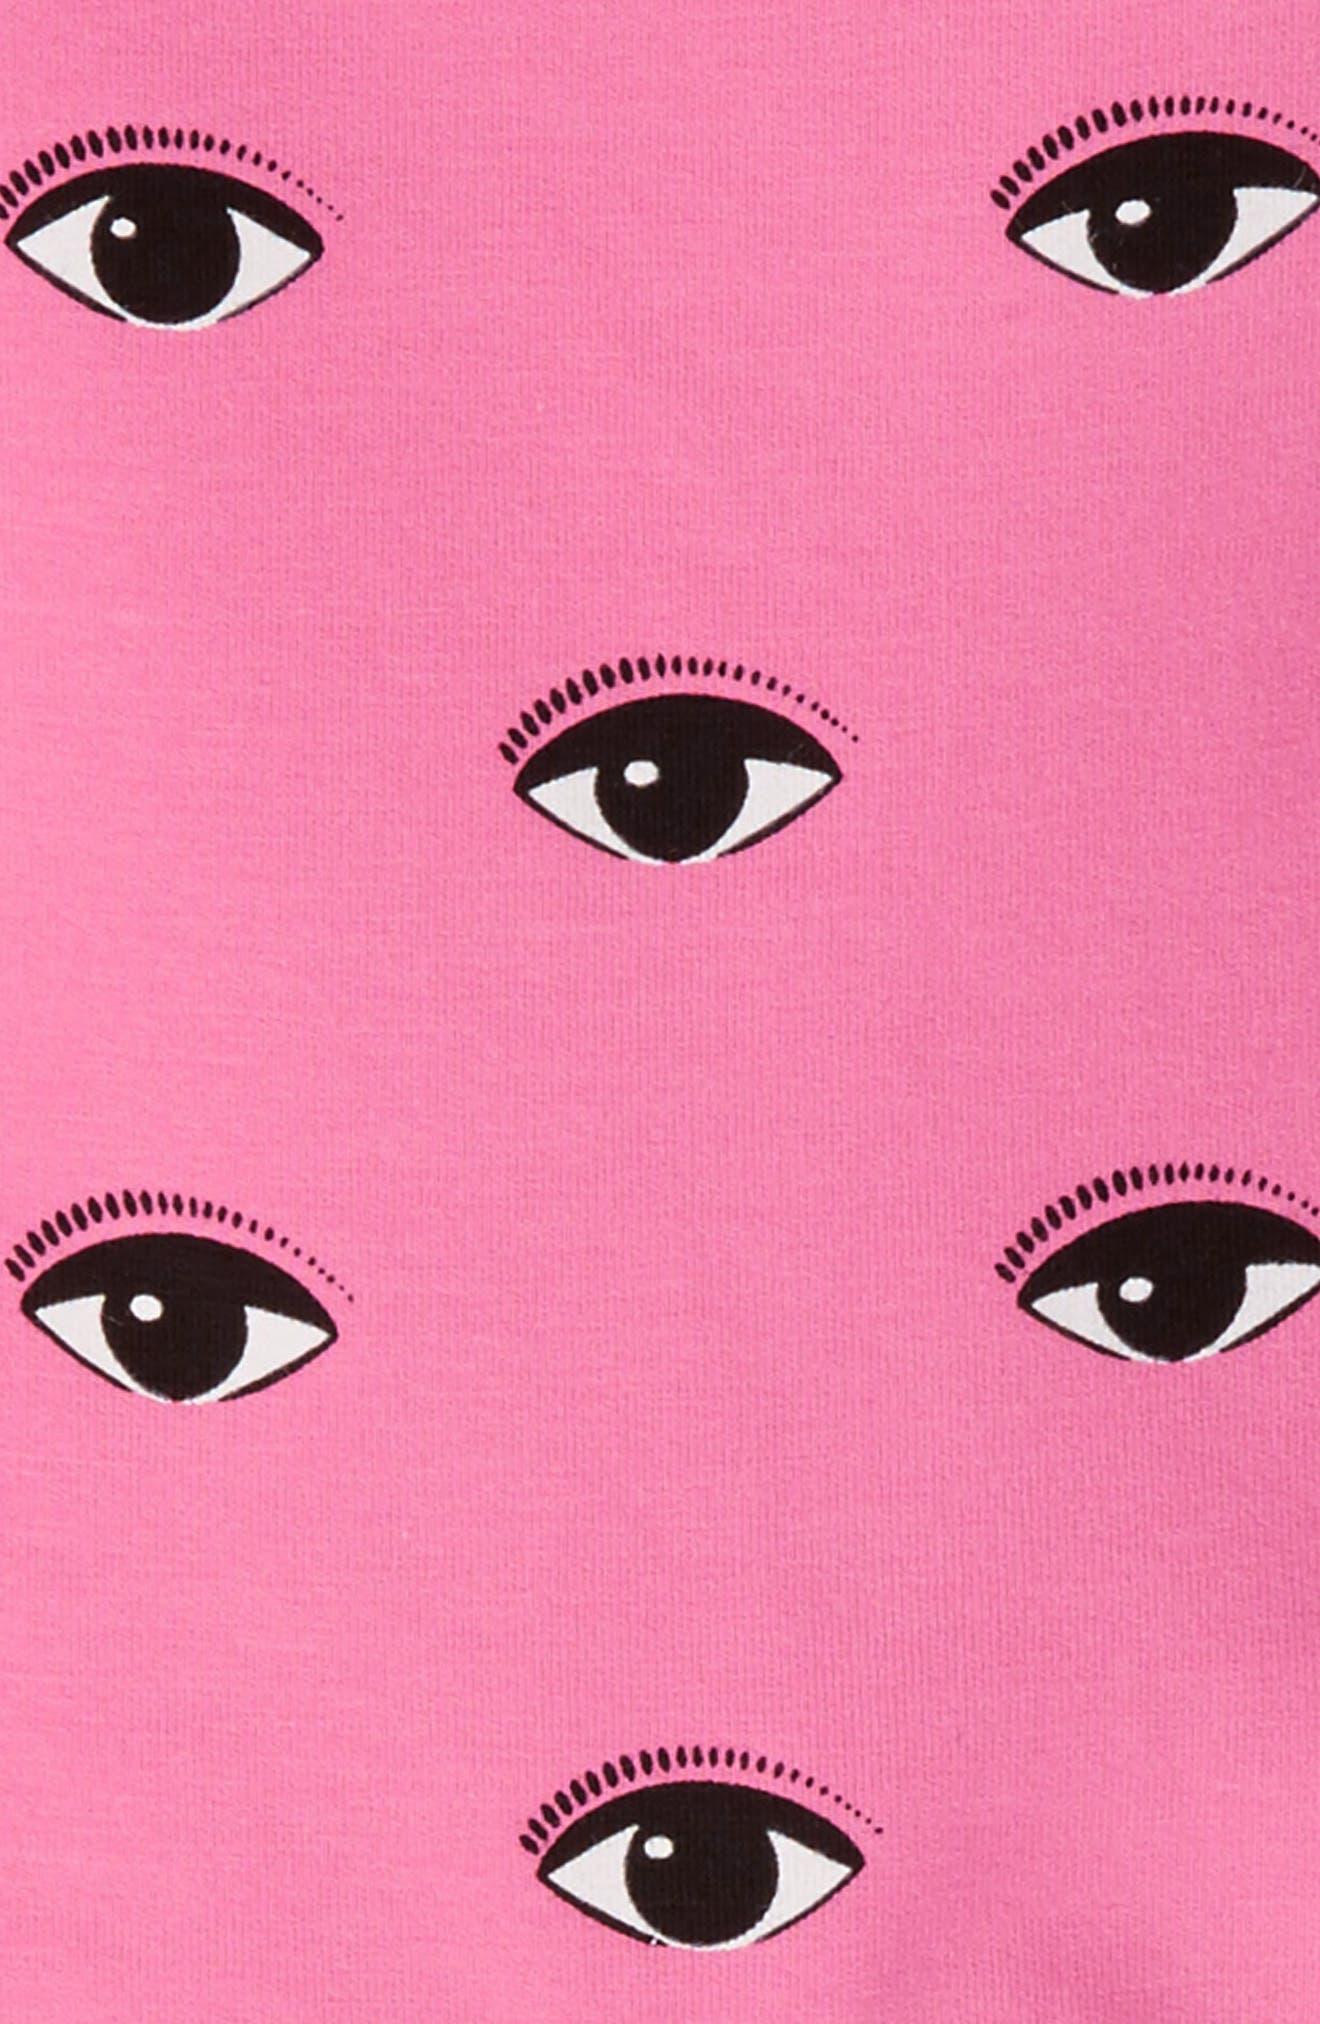 Eye Print Sweatshirt,                             Alternate thumbnail 2, color,                             Old Pink